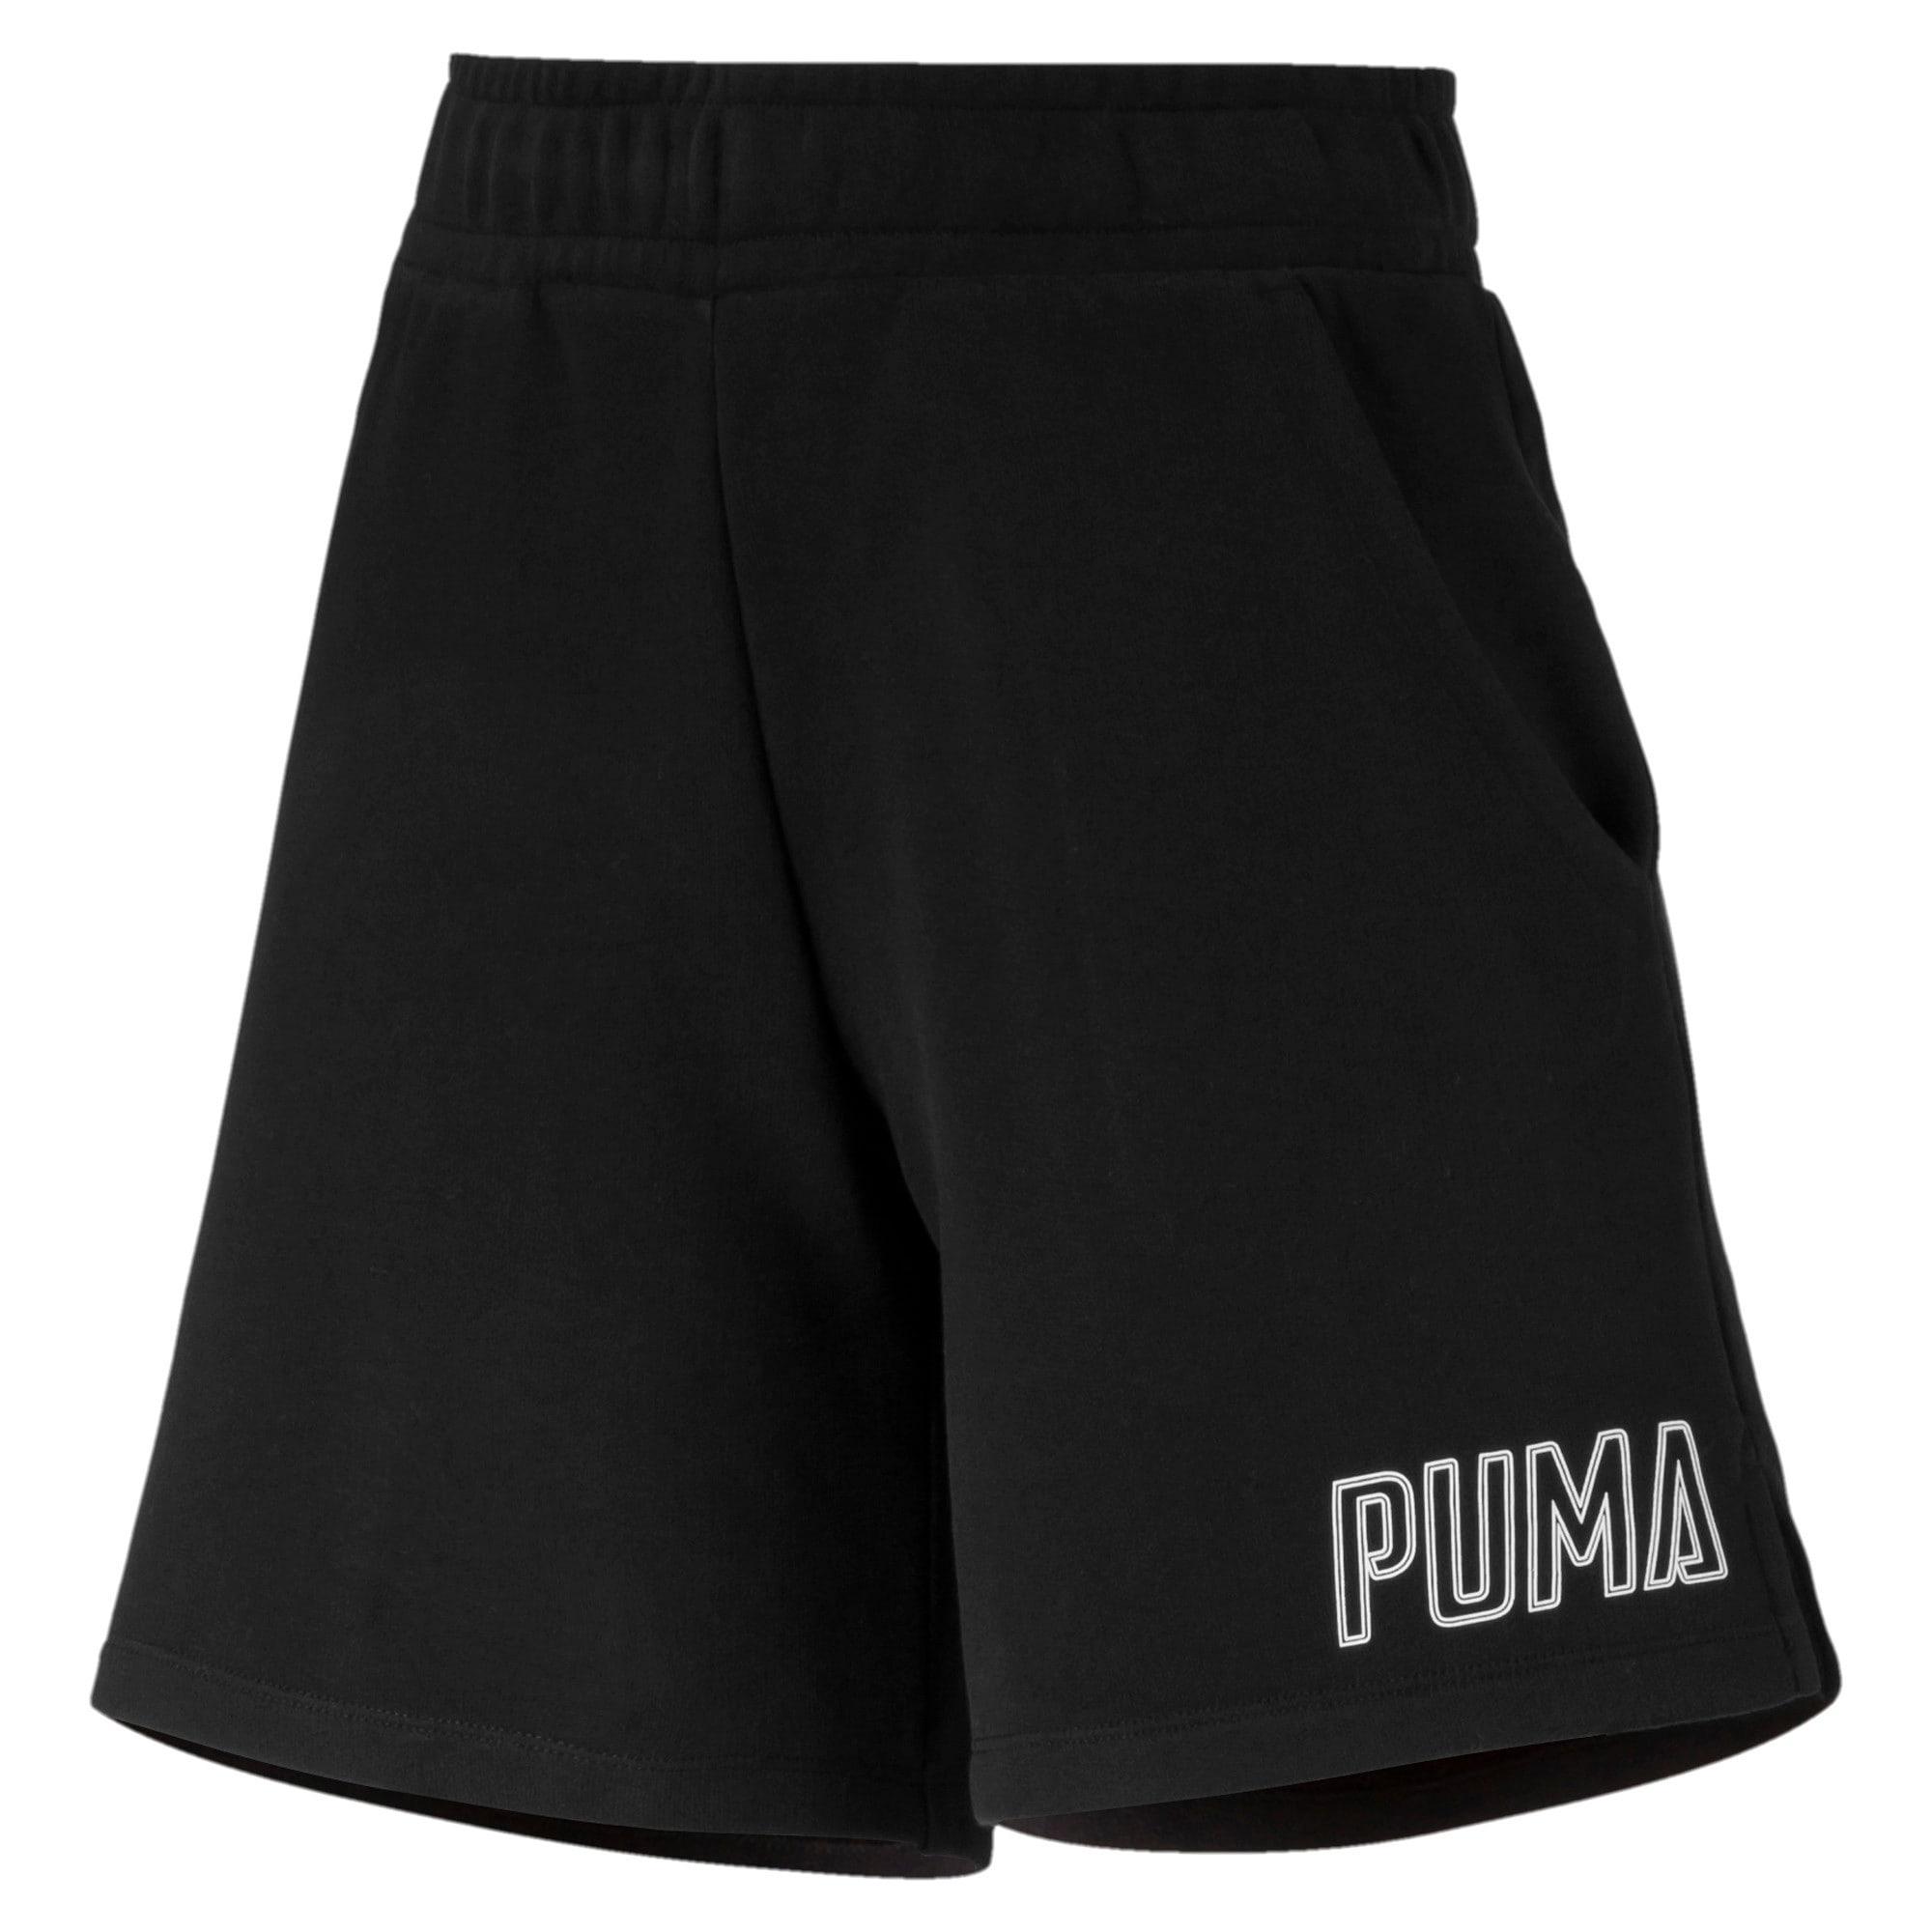 Thumbnail 4 of Athletics Women's Sweat Shorts, Puma Black, medium